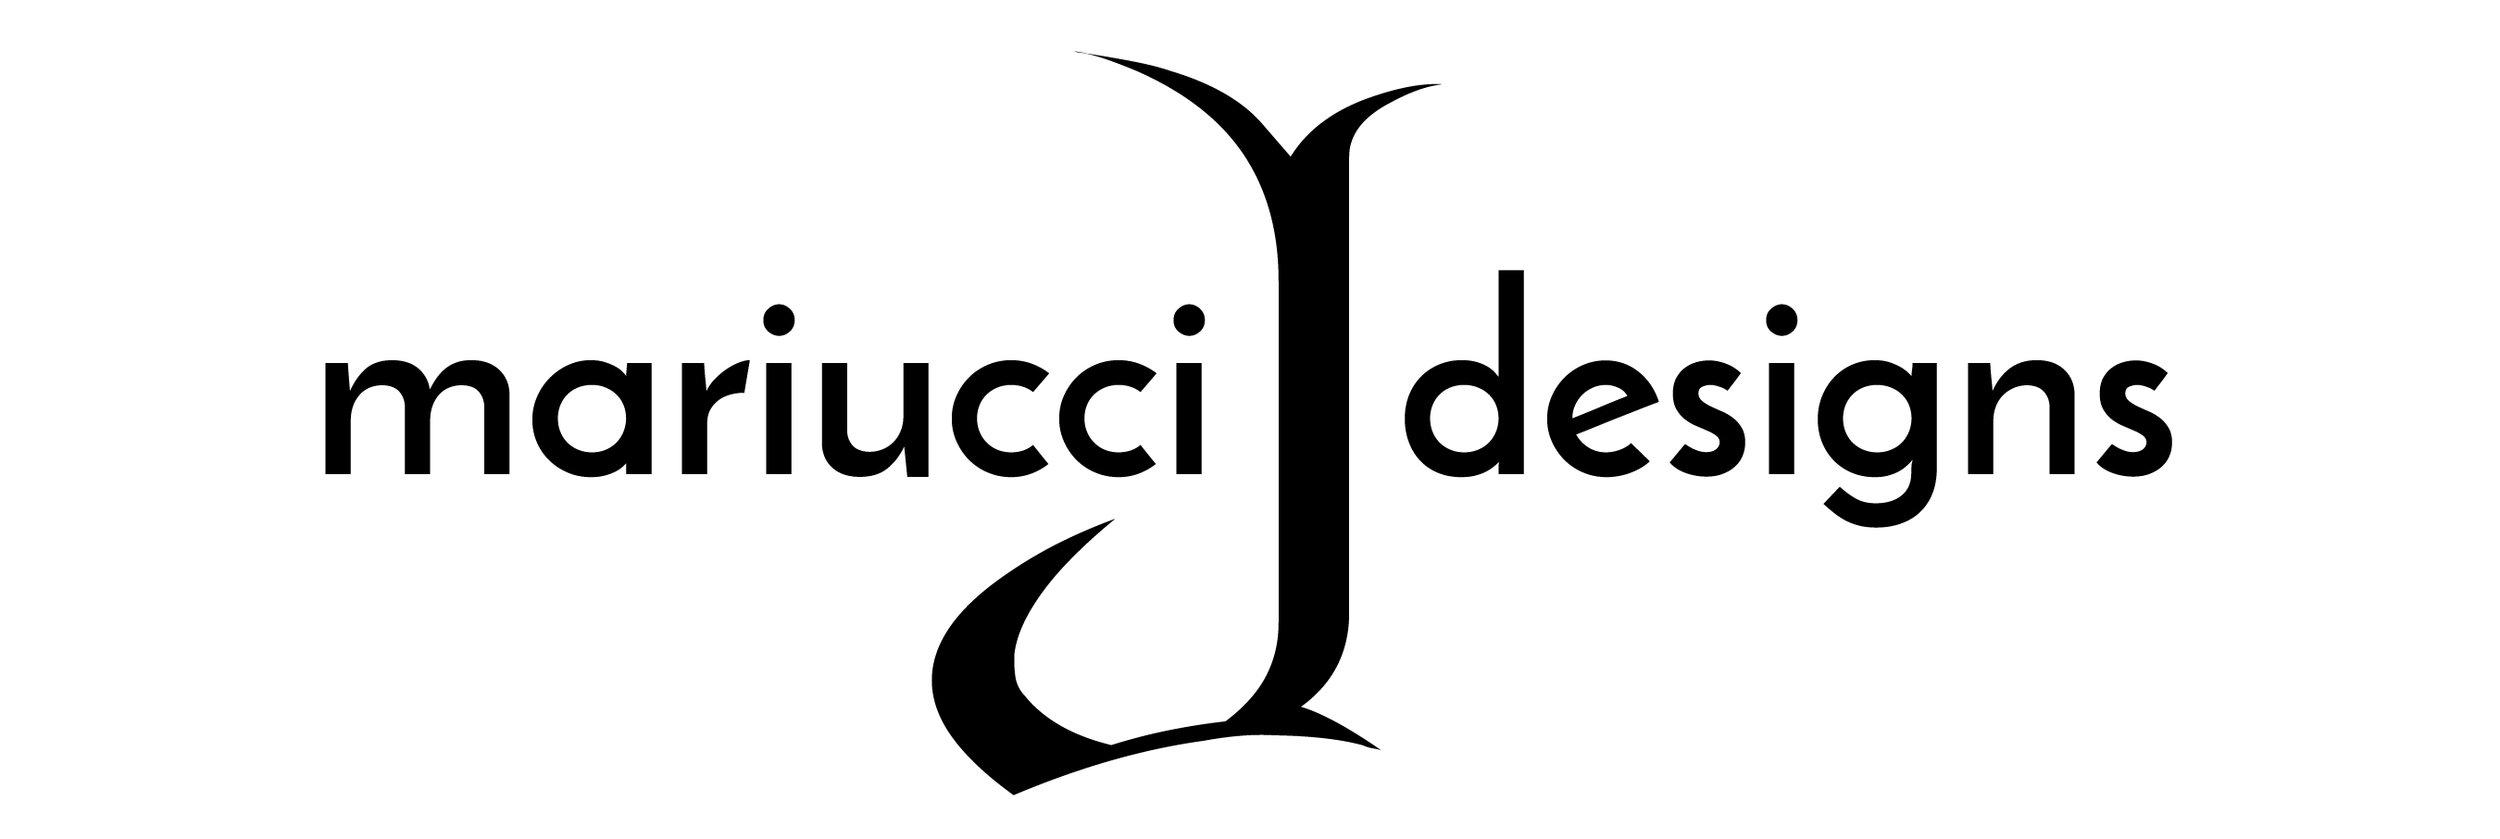 mariuccijdesigns_logo black.jpg